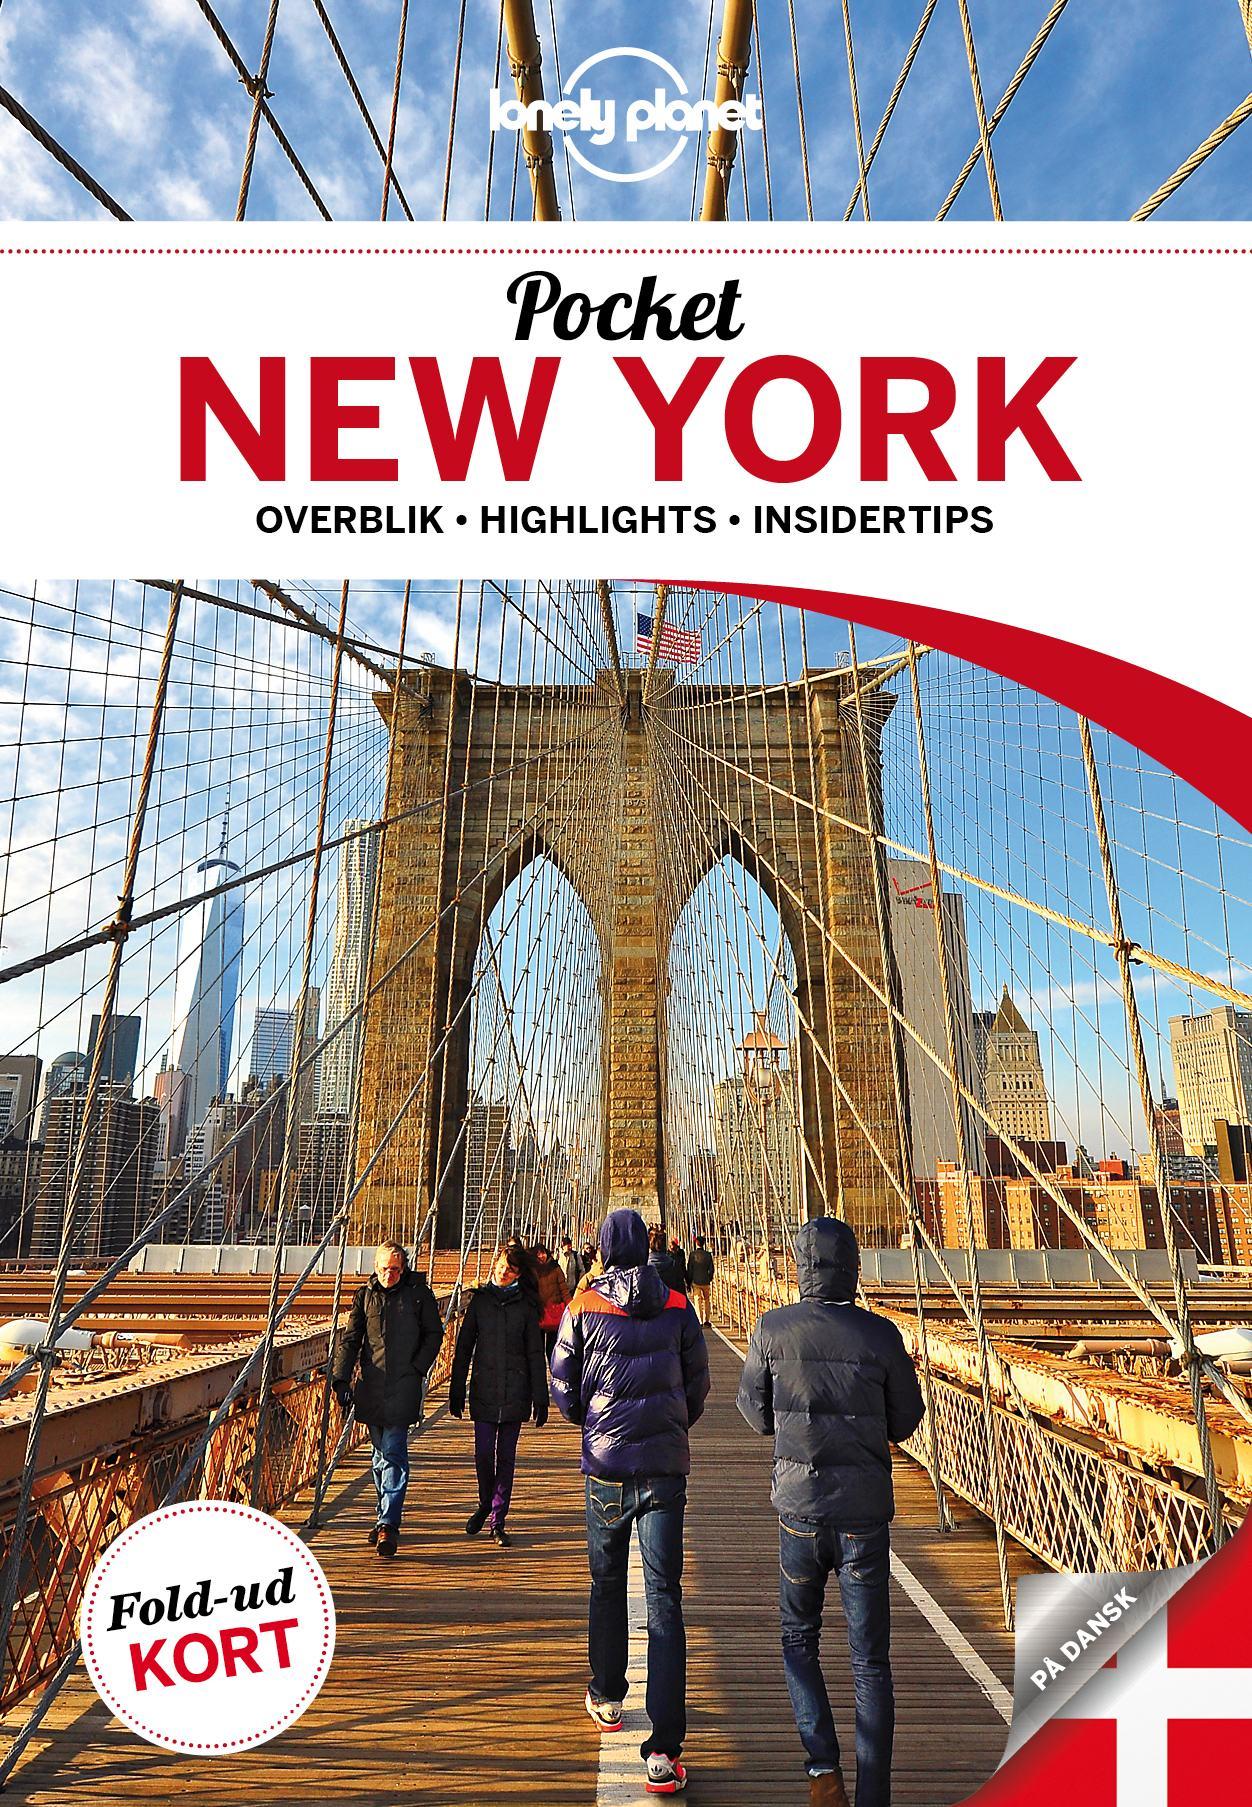 Pocket New York